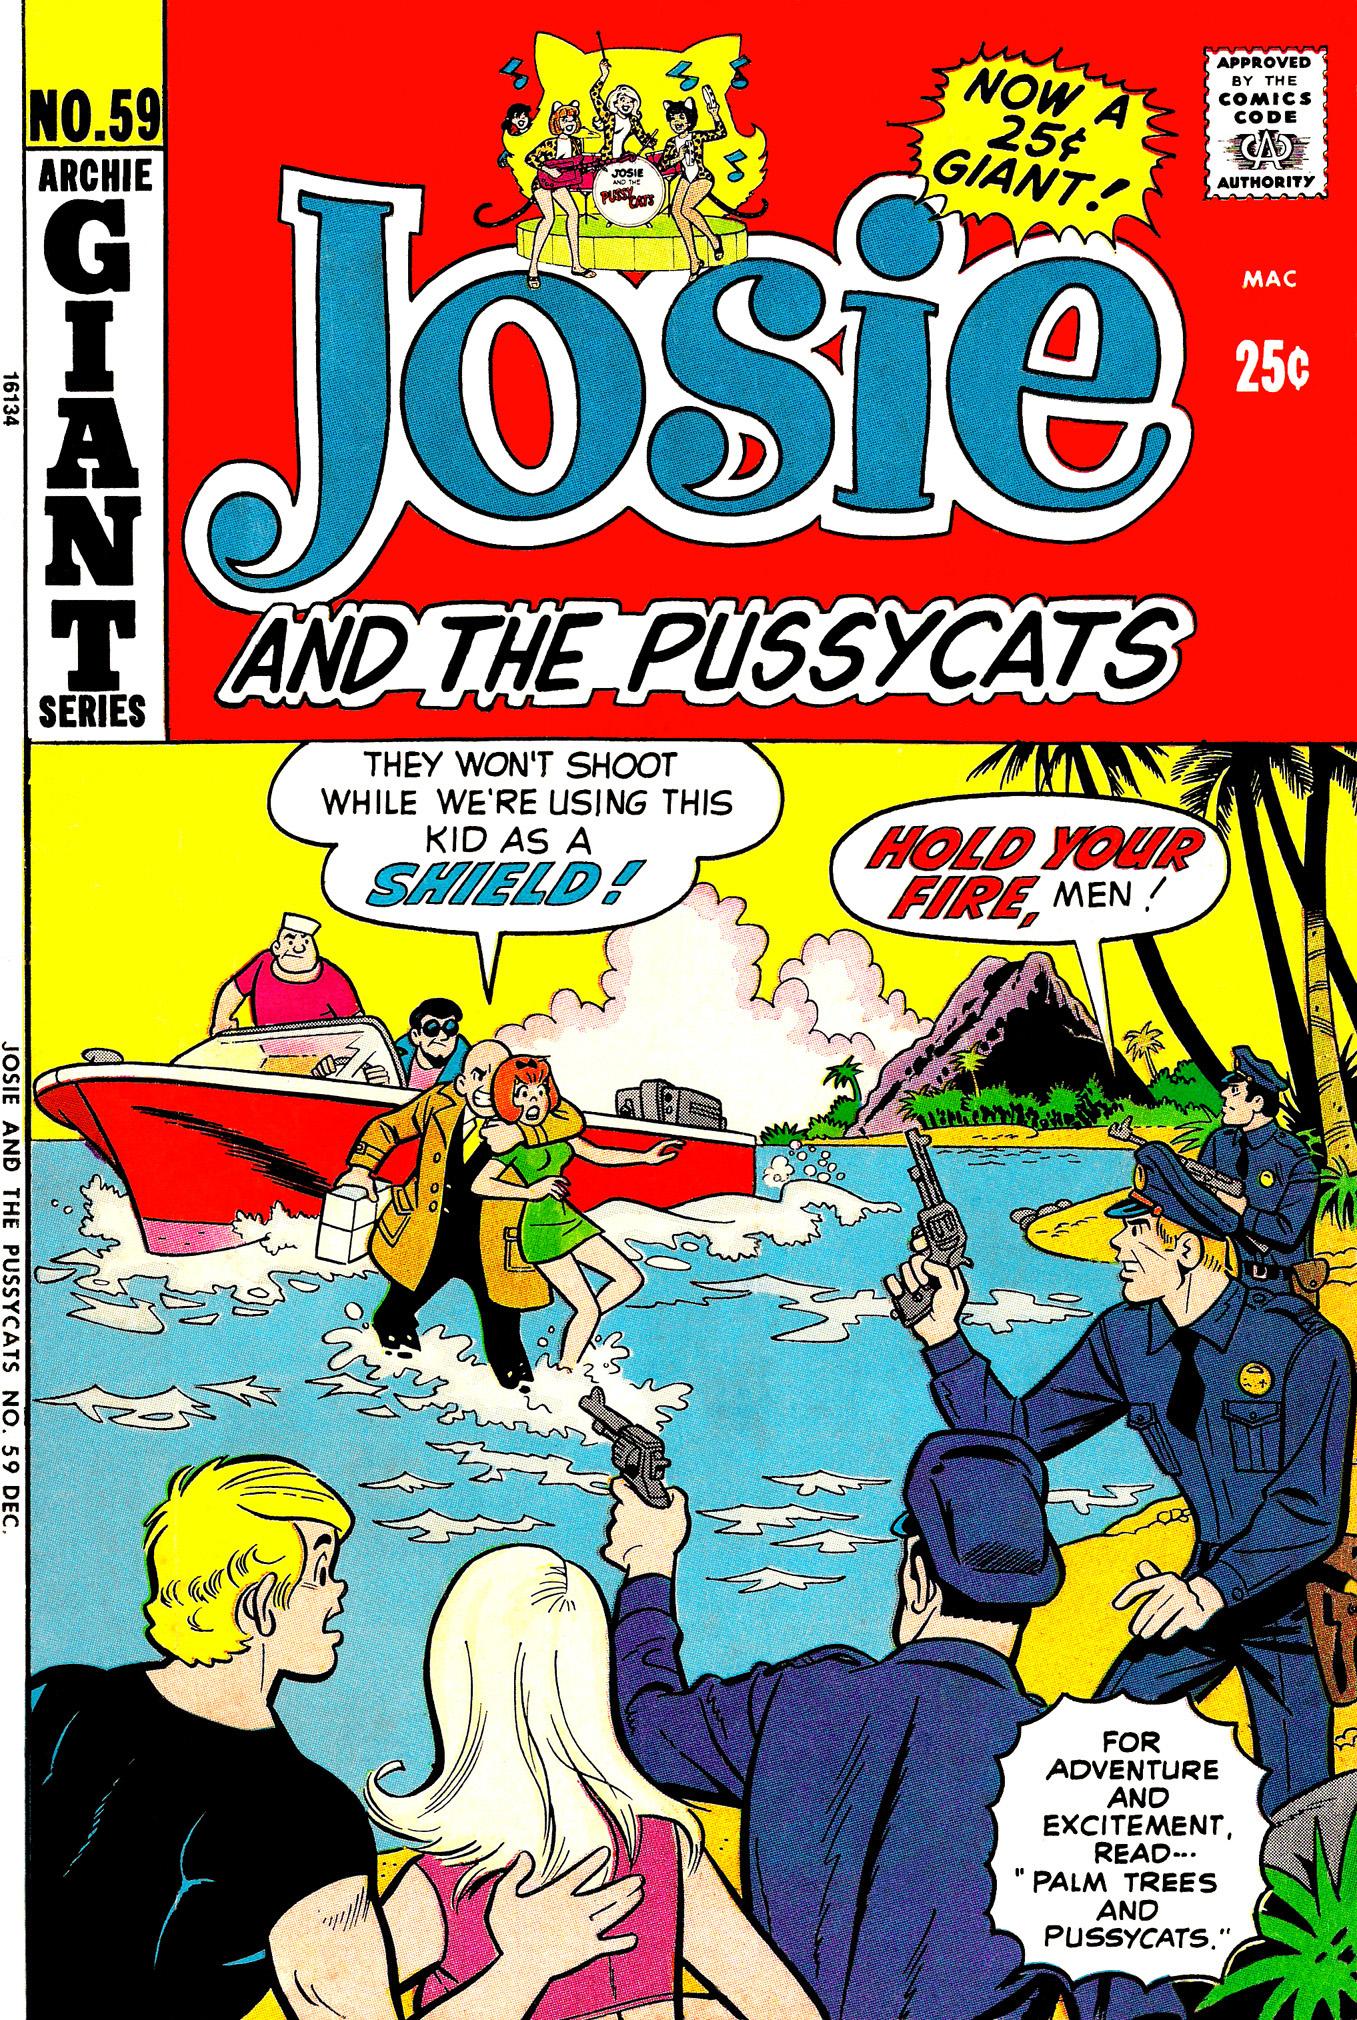 Read online She's Josie comic -  Issue #59 - 1